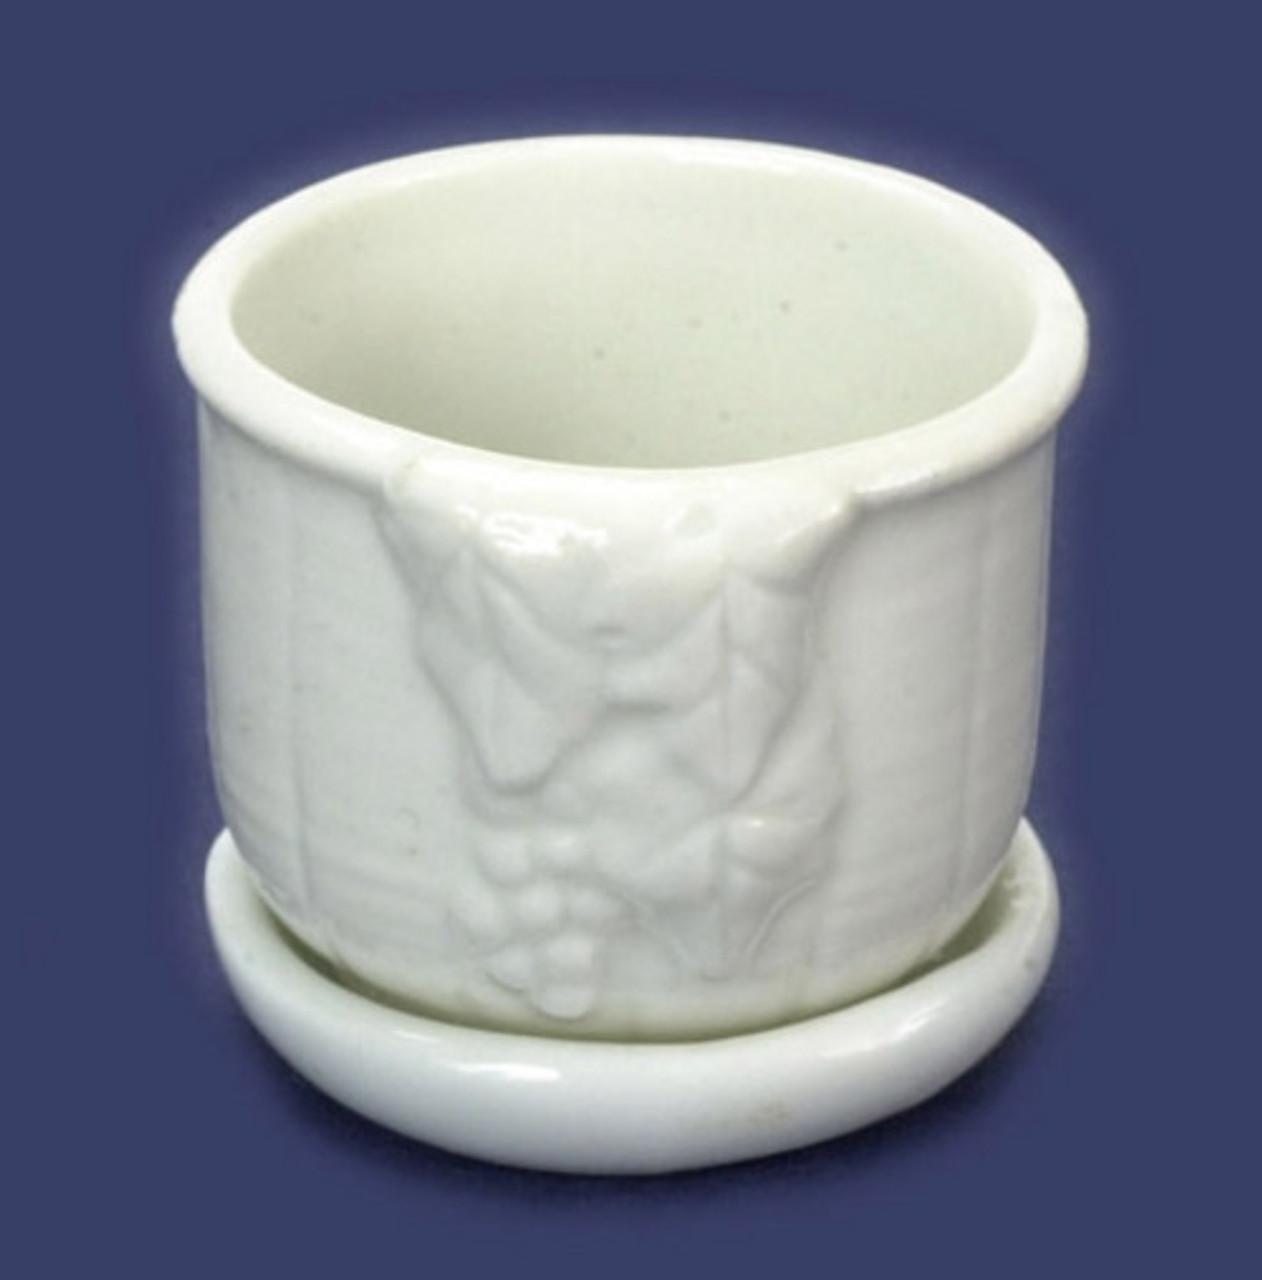 White Porcelain Planter - Grape